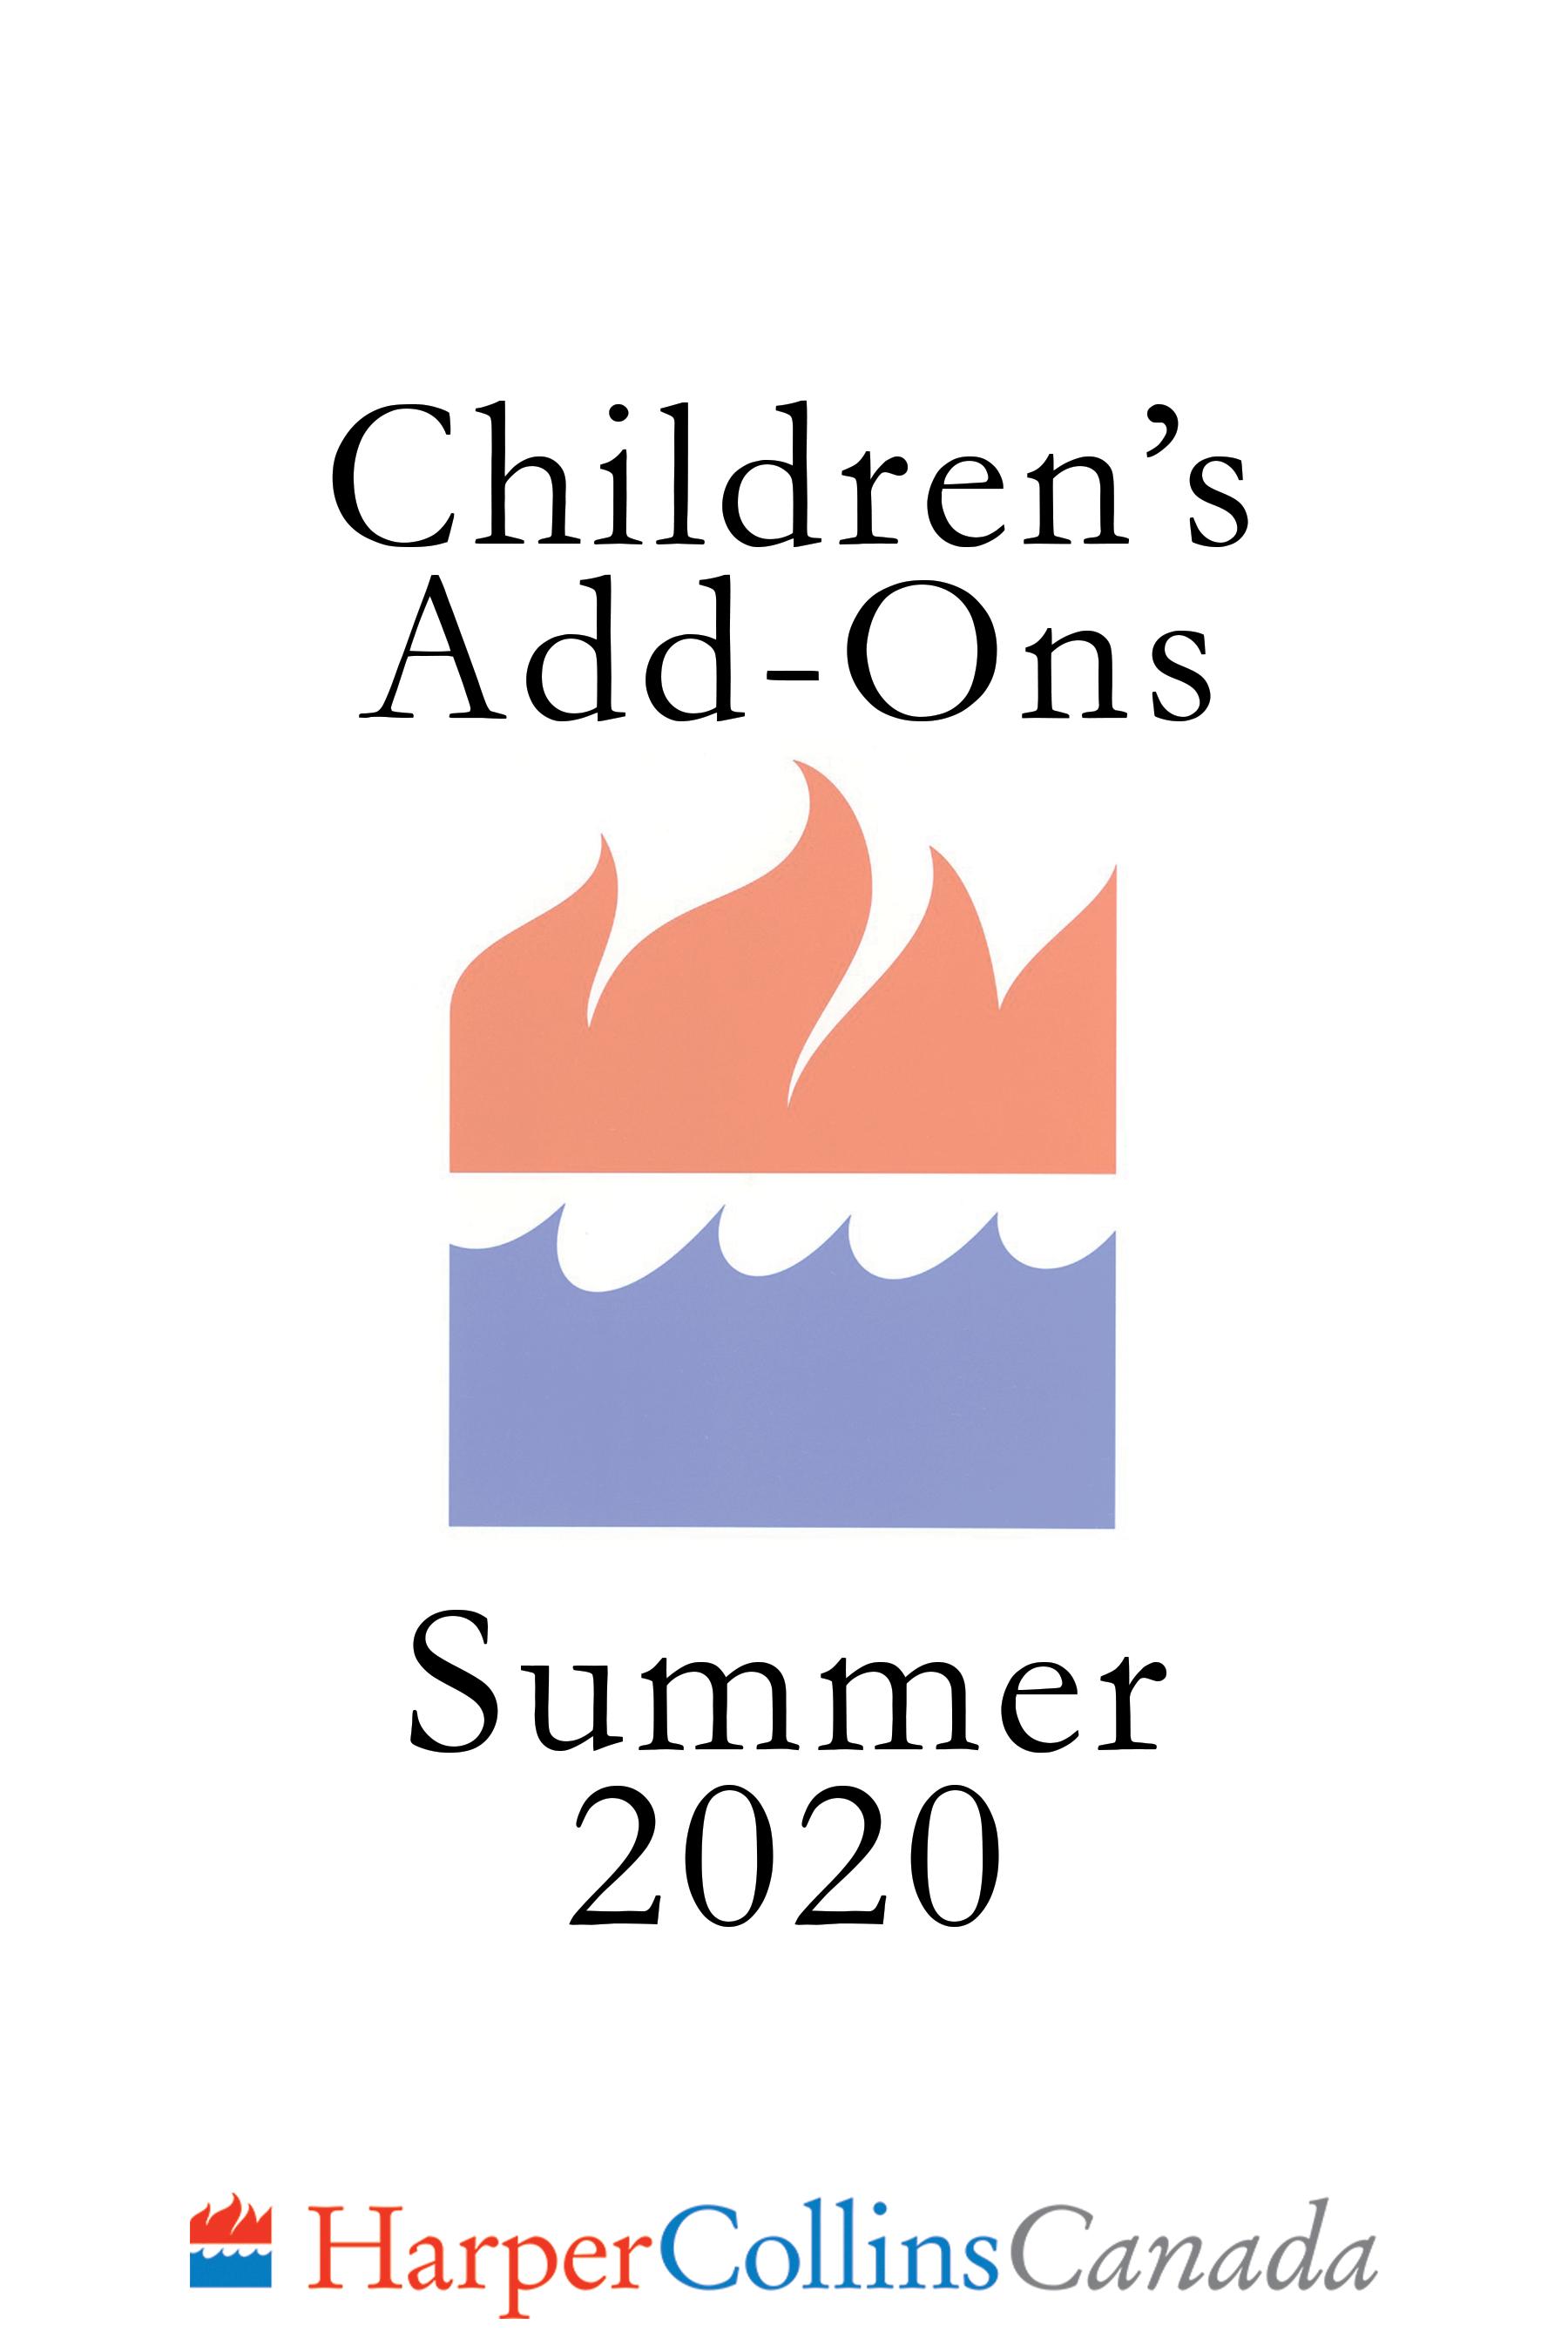 S20 CHILDREN'S ADD-ONS